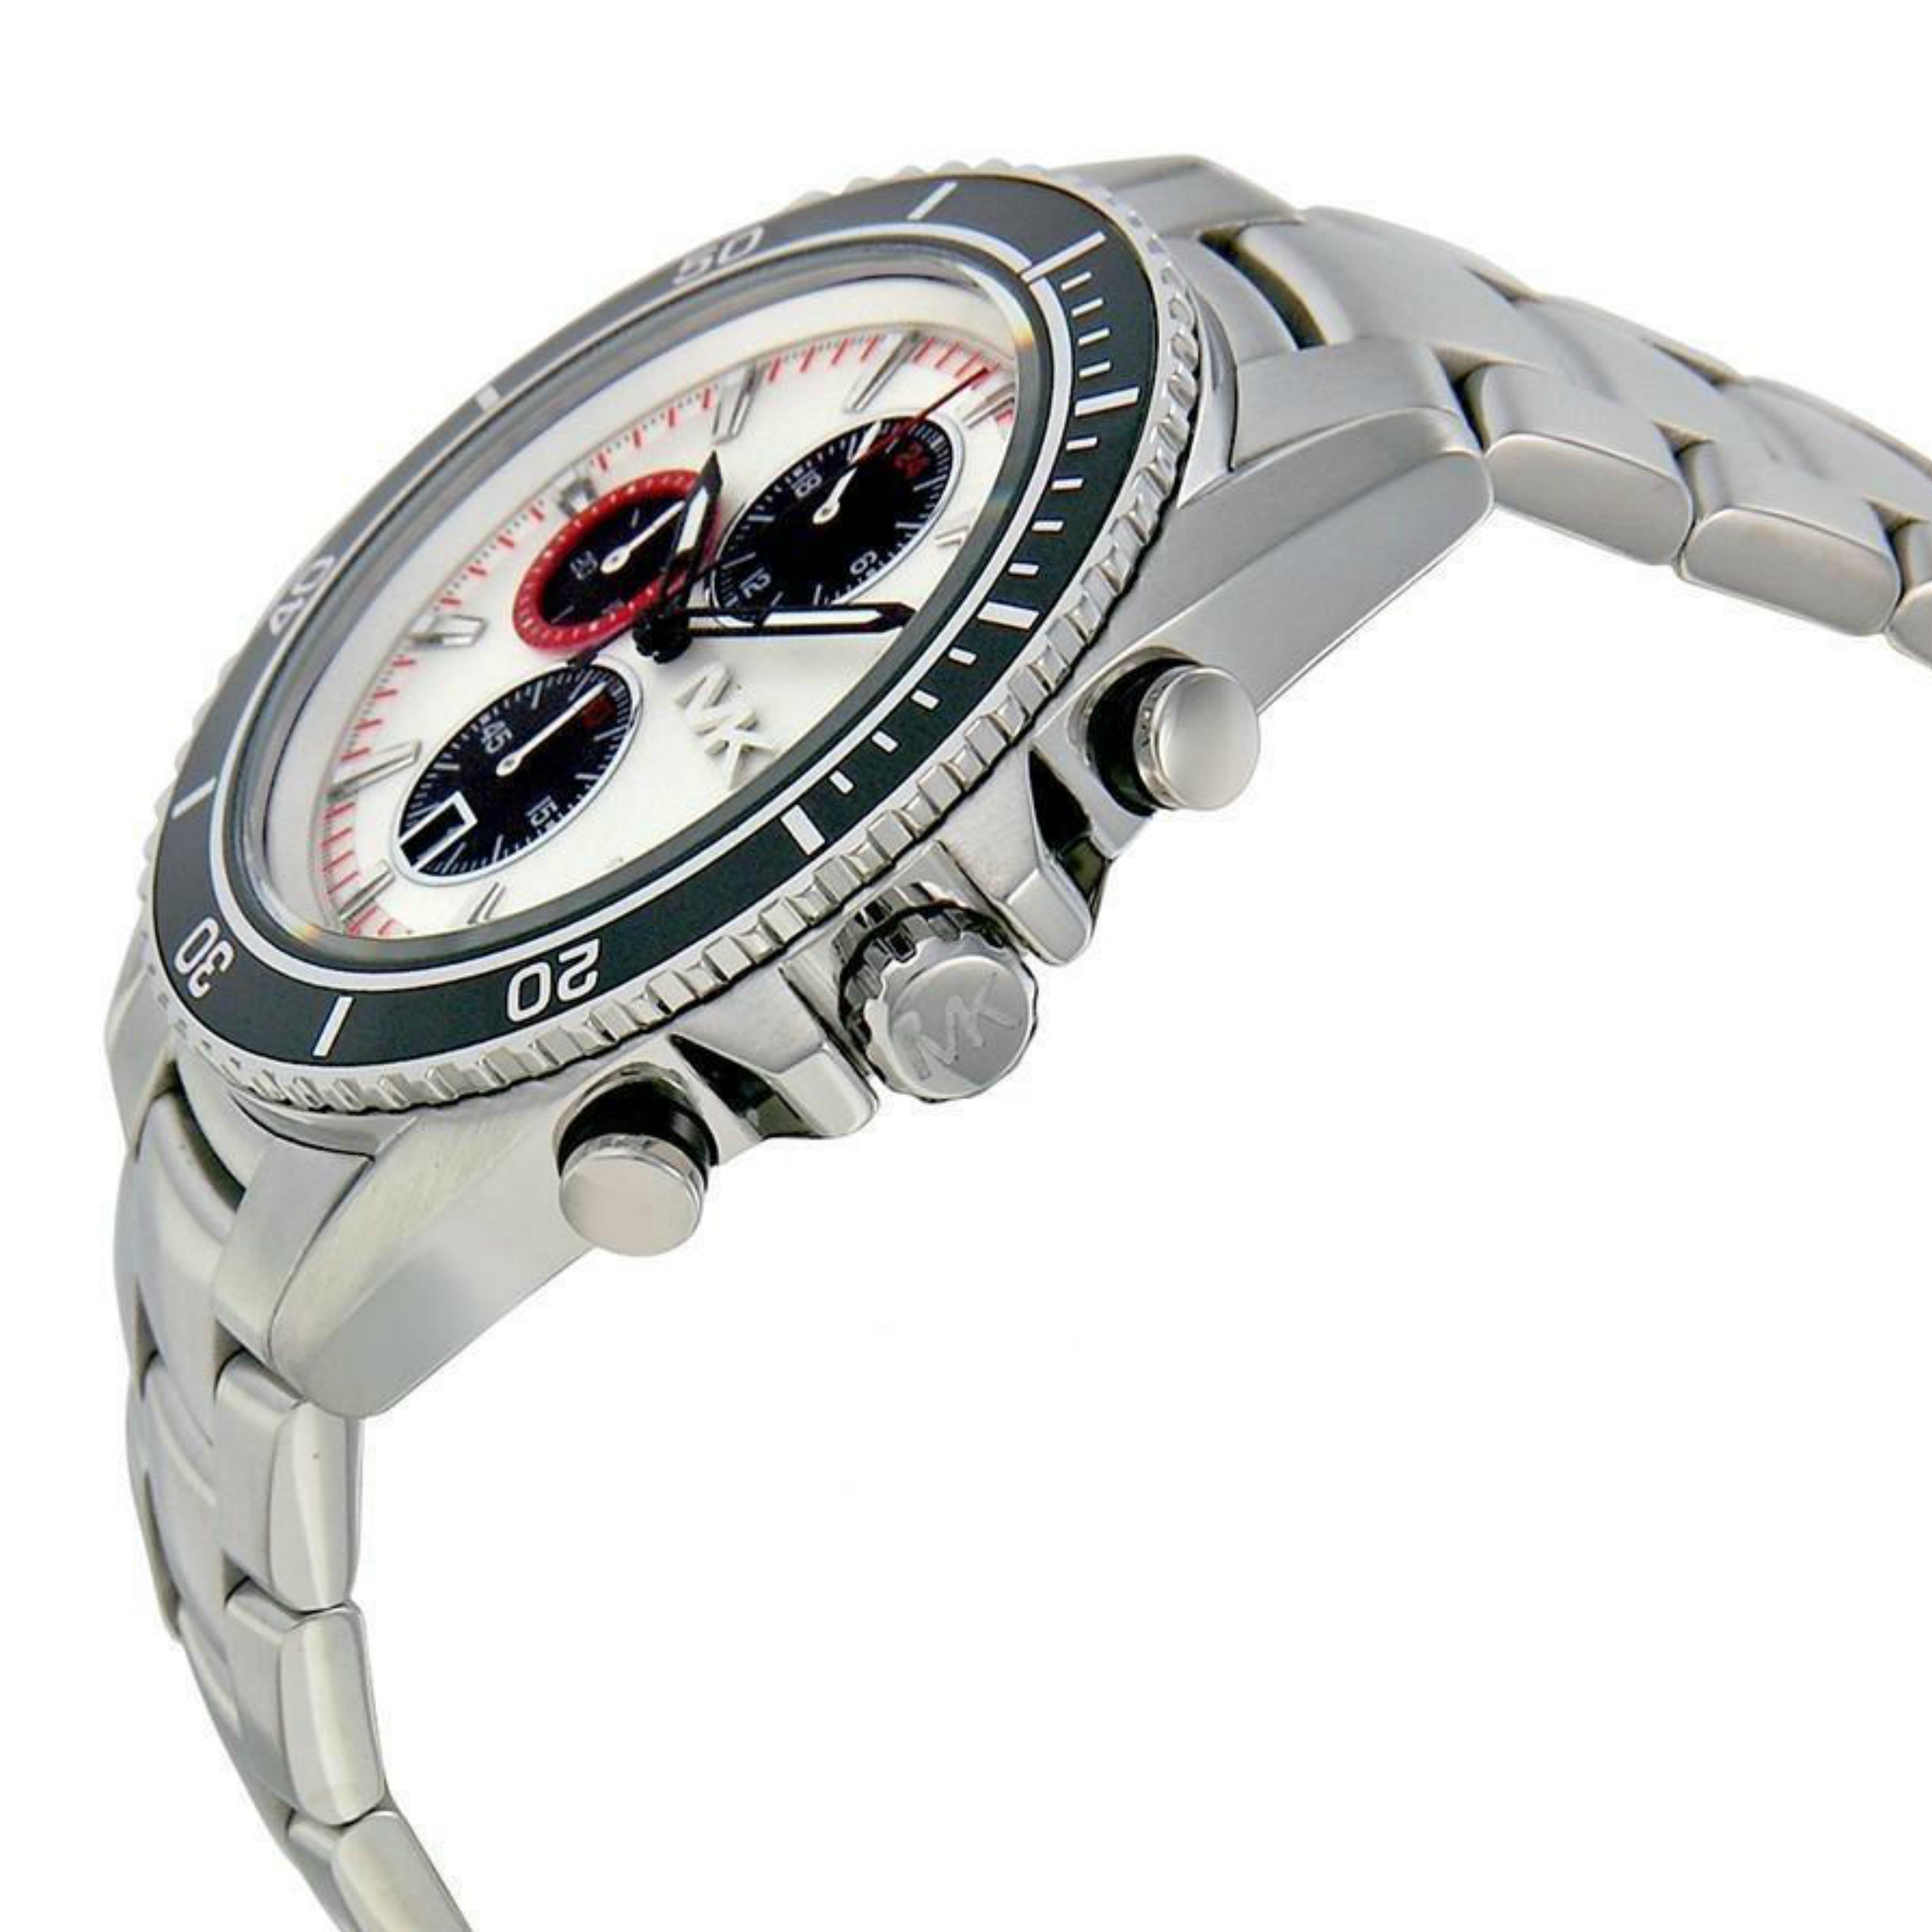 eee34ab3dfba Michael Kors Bradshaw Logo Dial Chronograph Designer Silver Men s Watch  MK8339 Thumbnail 2